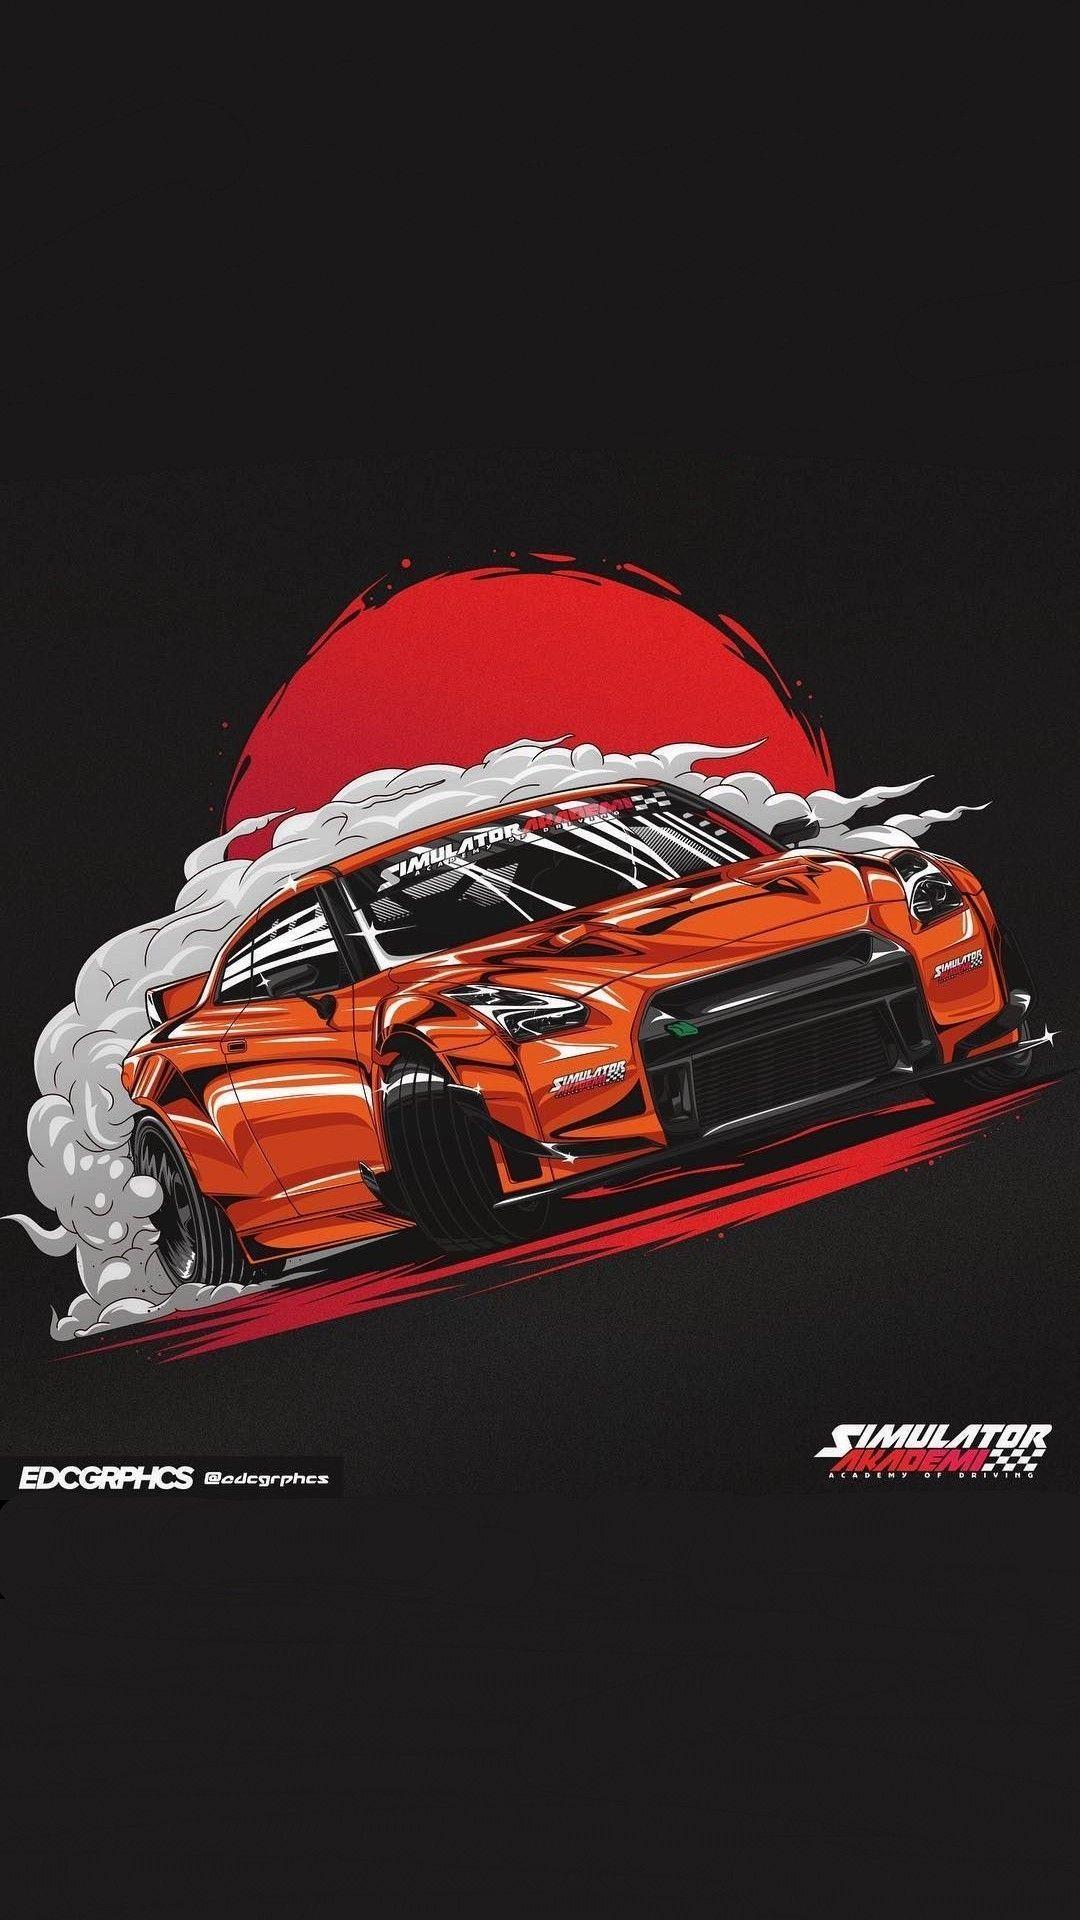 Japan Car Wallpapers Top Free Japan Car Backgrounds